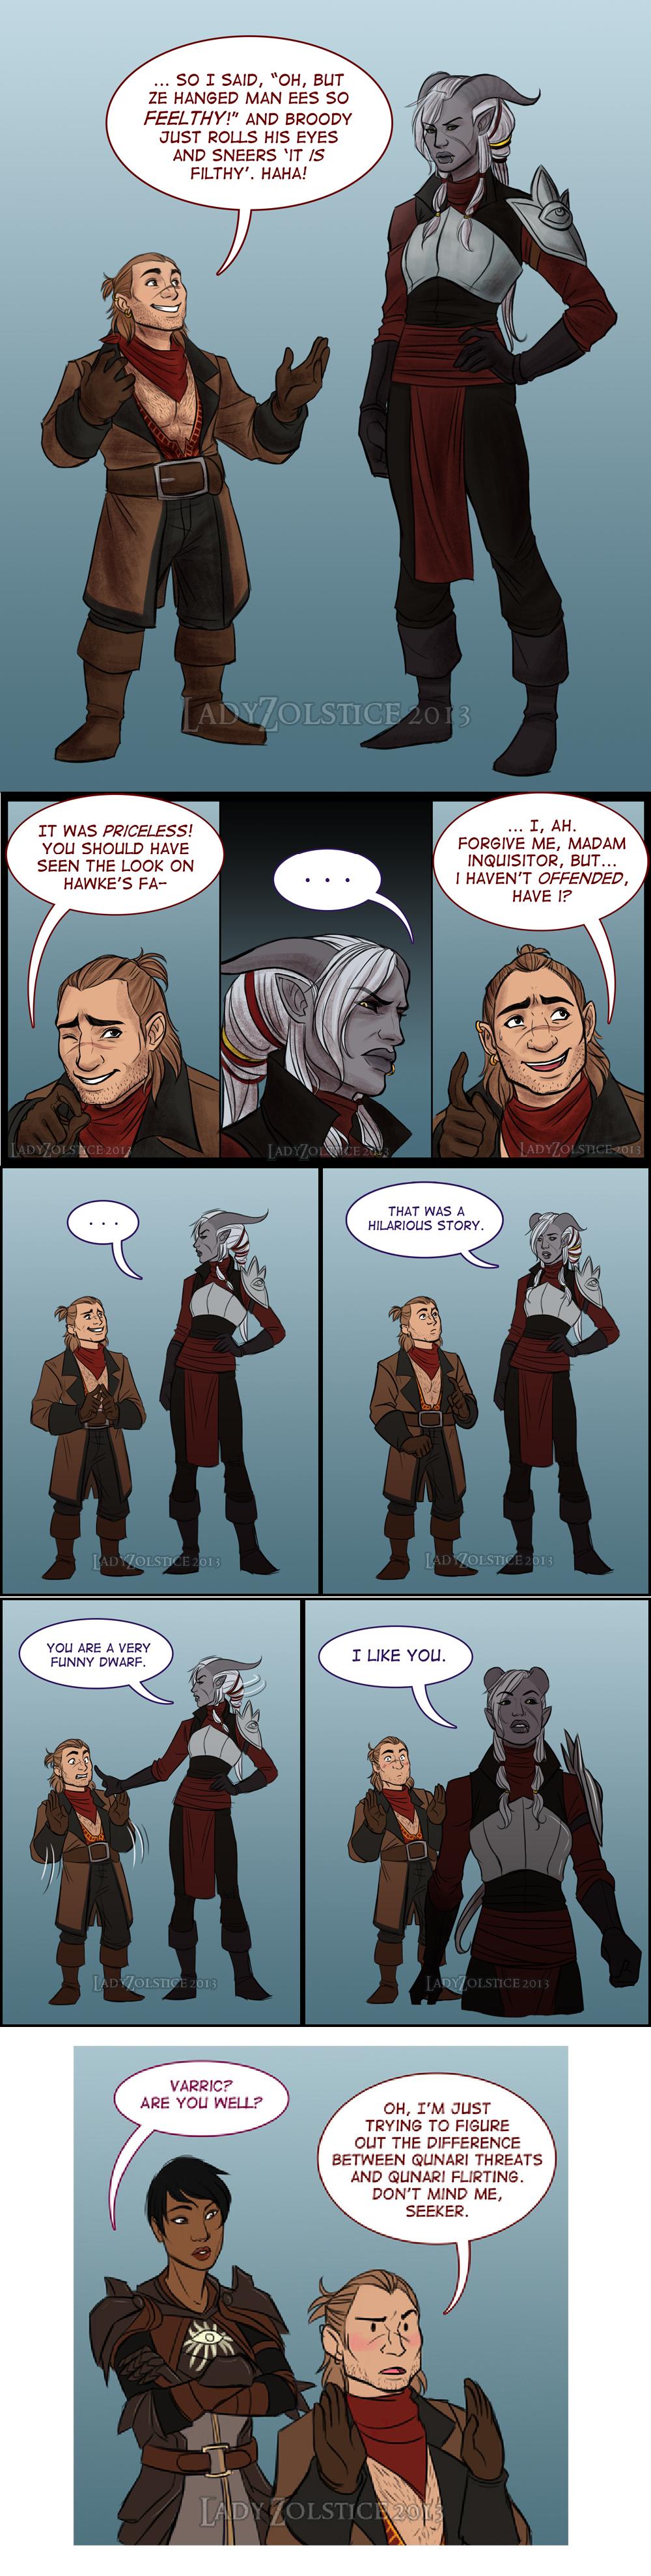 Pin By Maddie M On Dragon Age Dragon Age Memes Dragon Age Funny Dragon Age Games